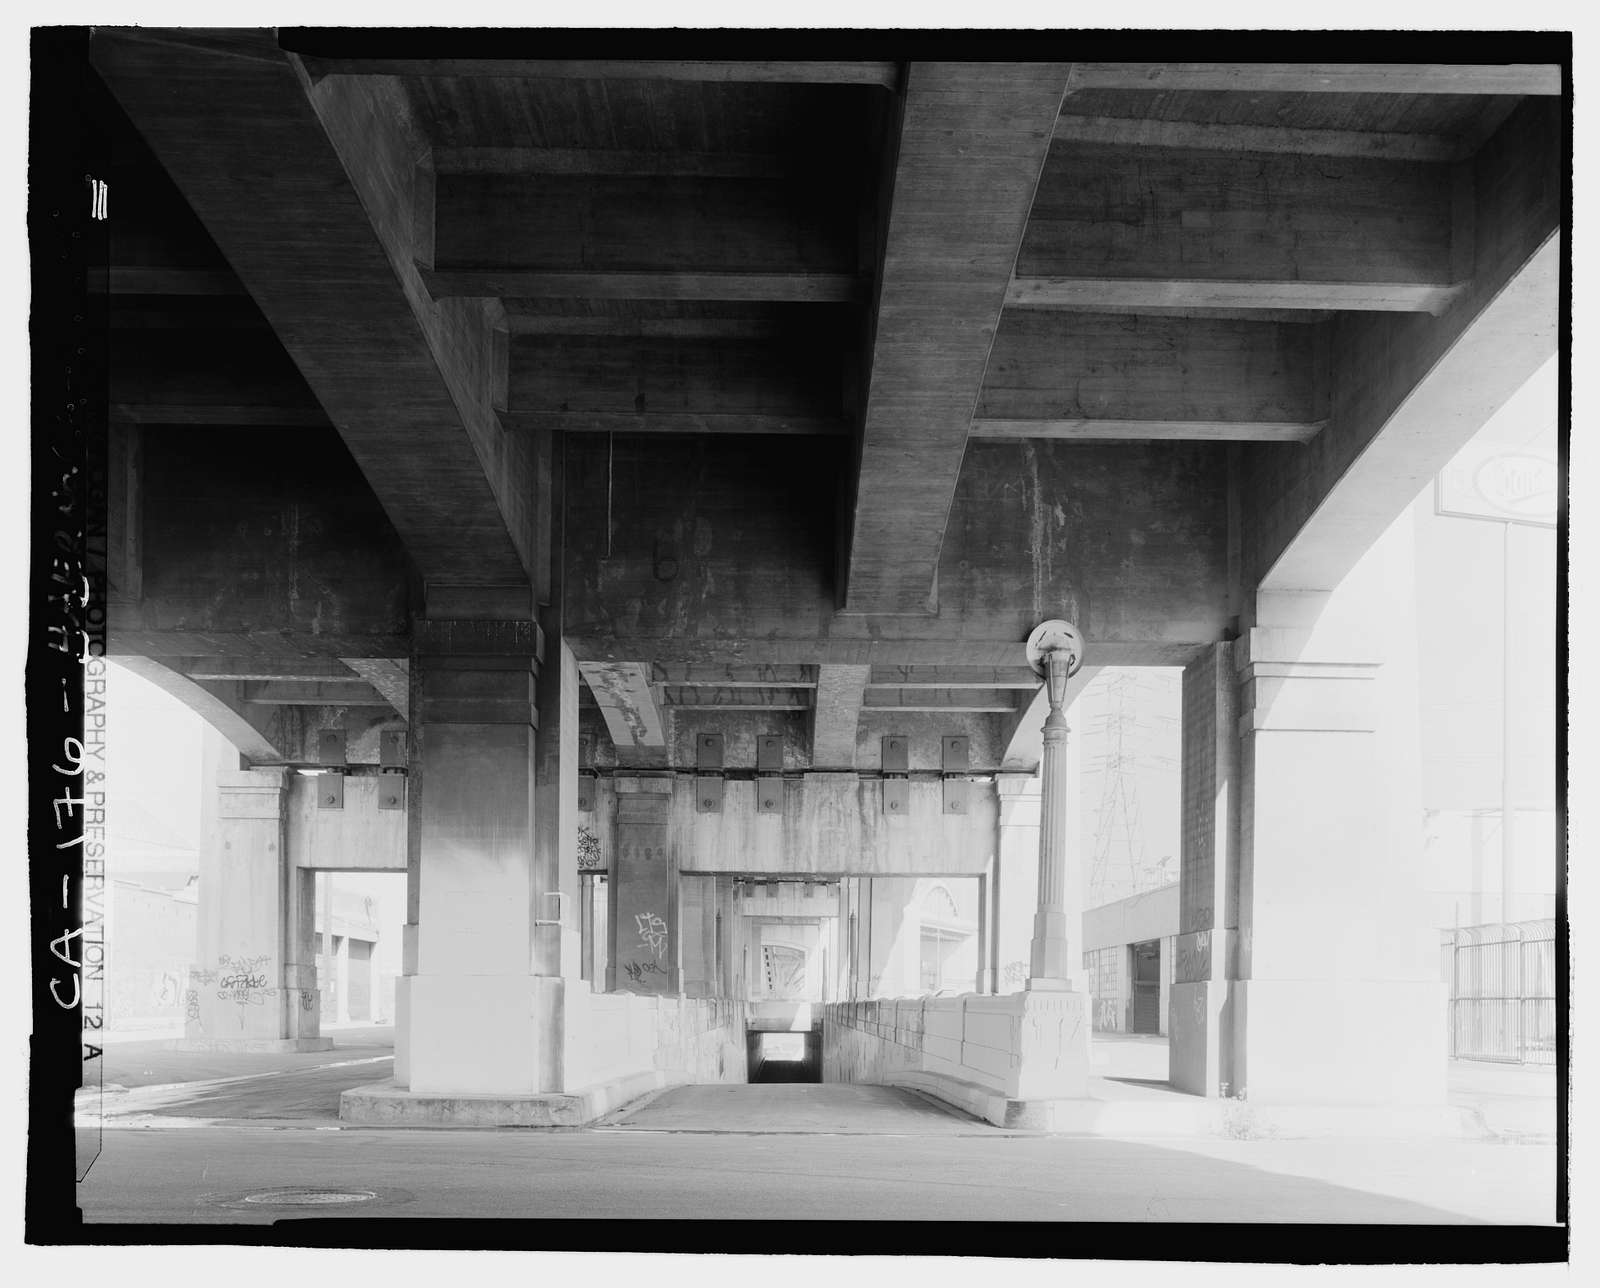 Sixth Street Bridge, Spanning 101 Freeway at Sixth Street, Los Angeles, Los Angeles County, CA